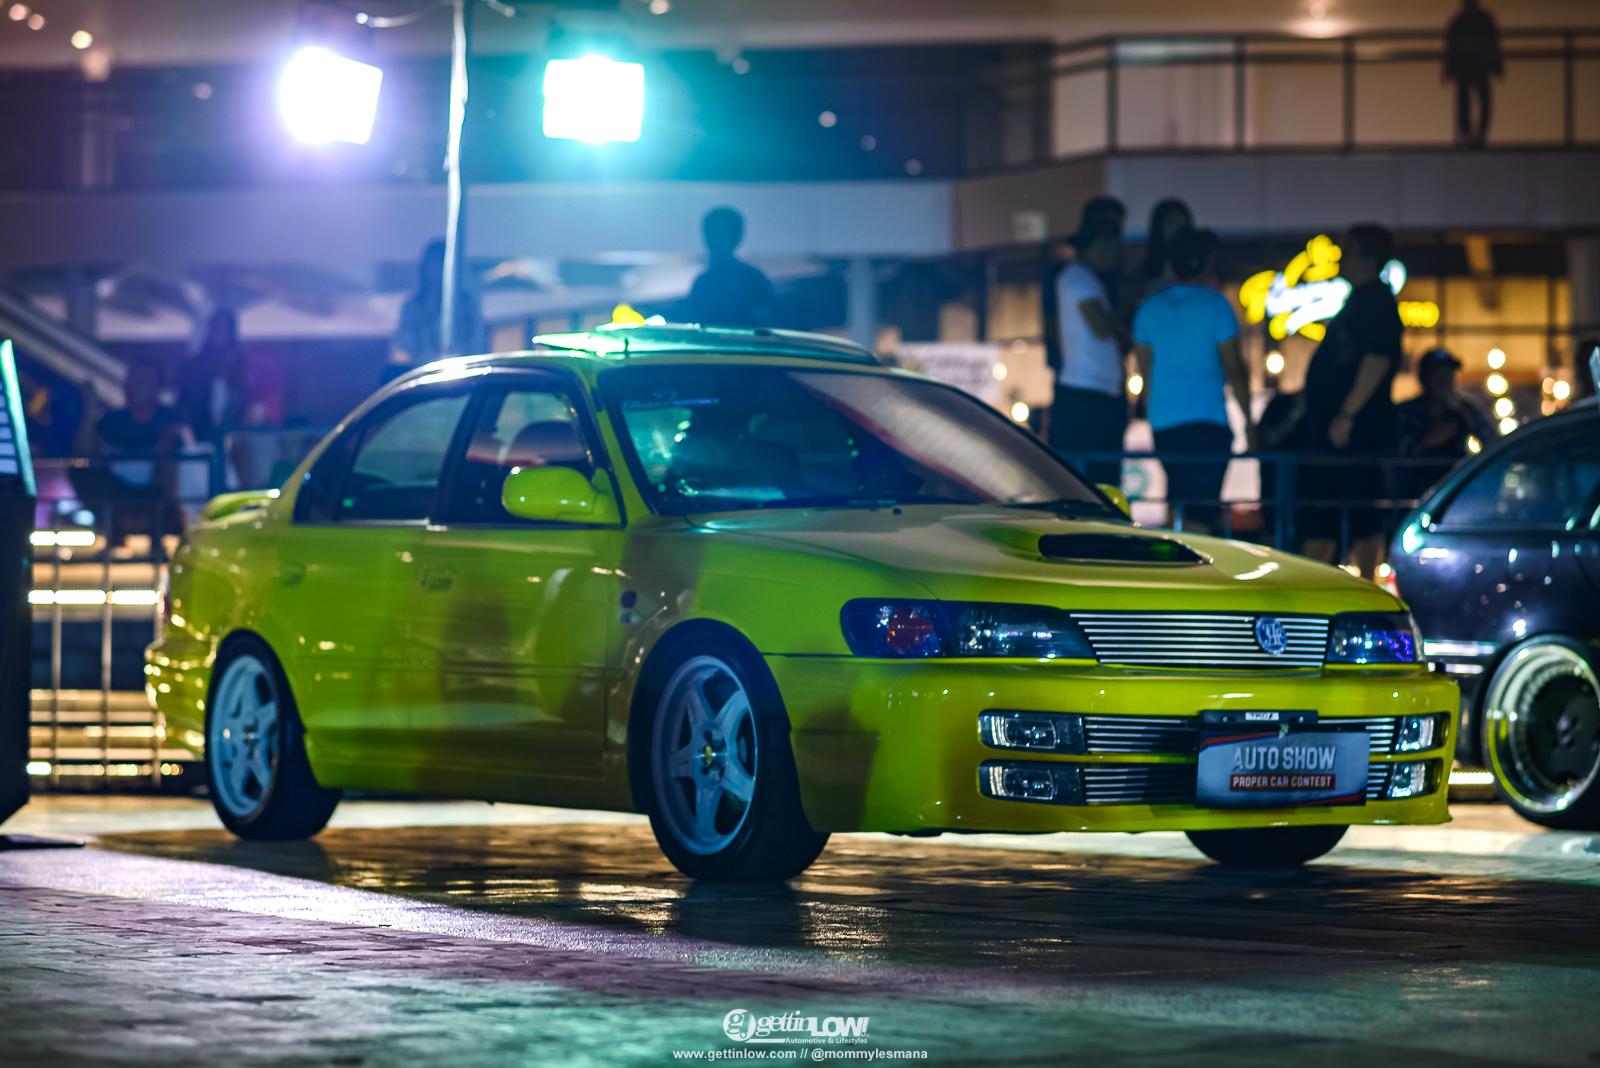 Intersport Autoshow Proper Car Contest 2018 Tangerang